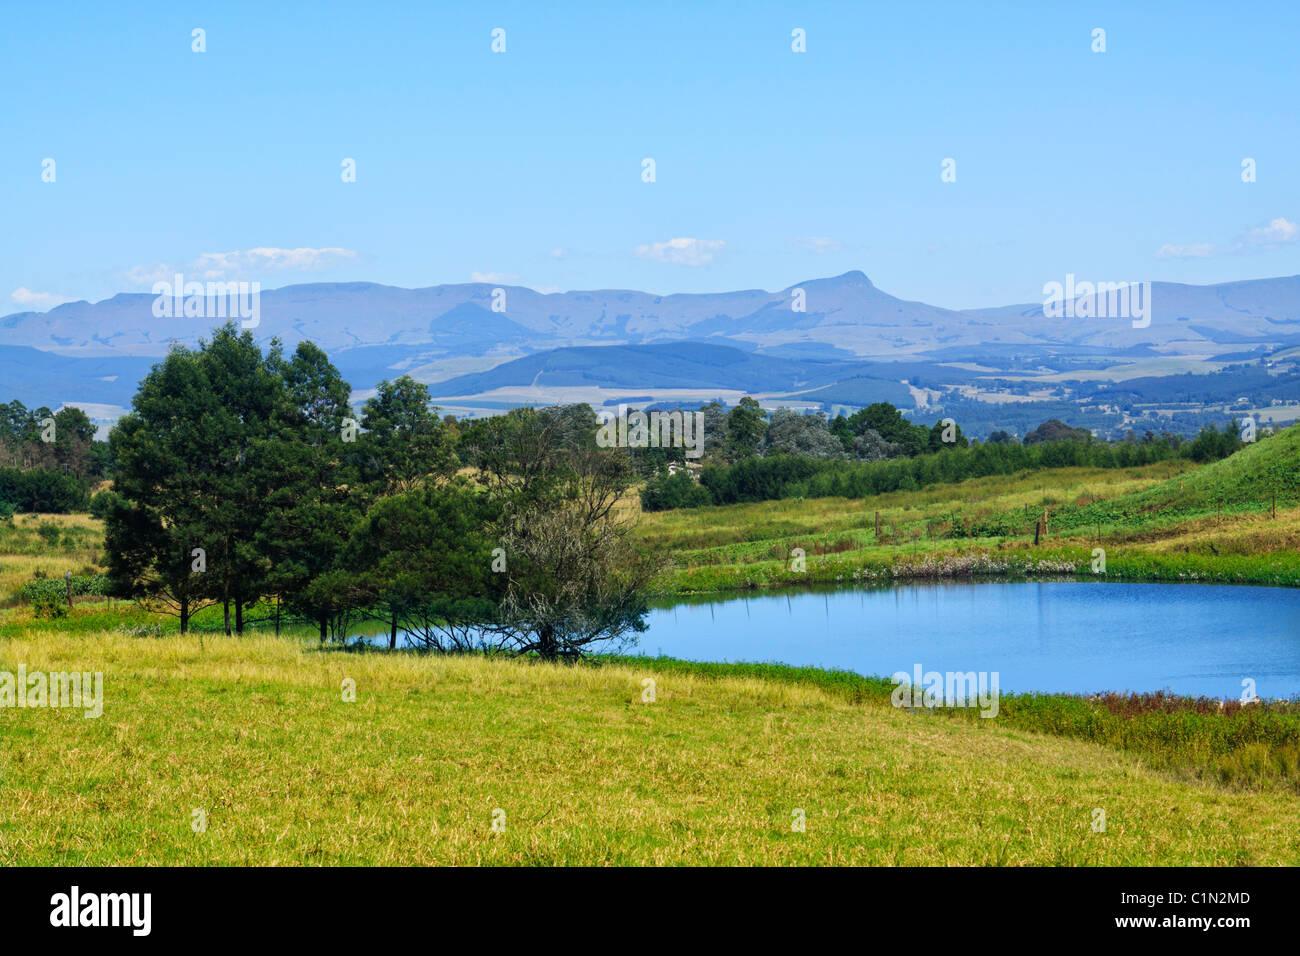 Paysage dans les Midlands, KwaZulu Natal, Afrique du Sud. Photo Stock